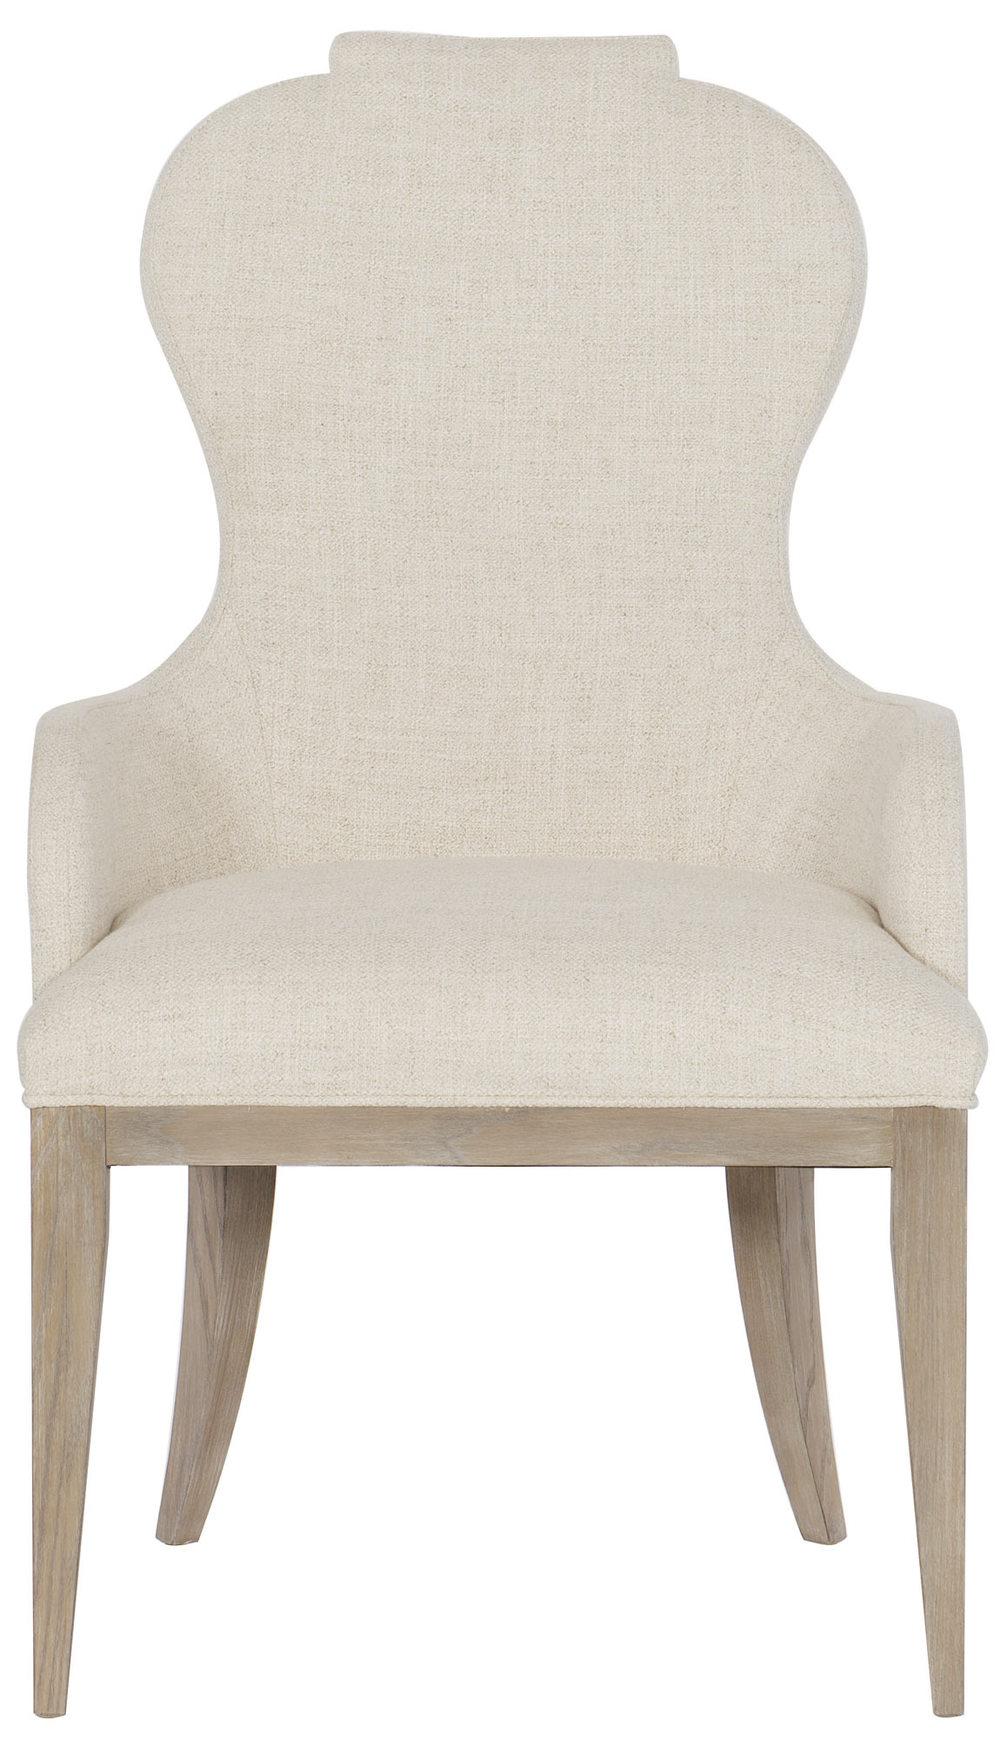 Bernhardt - Upholstered Arm Chair